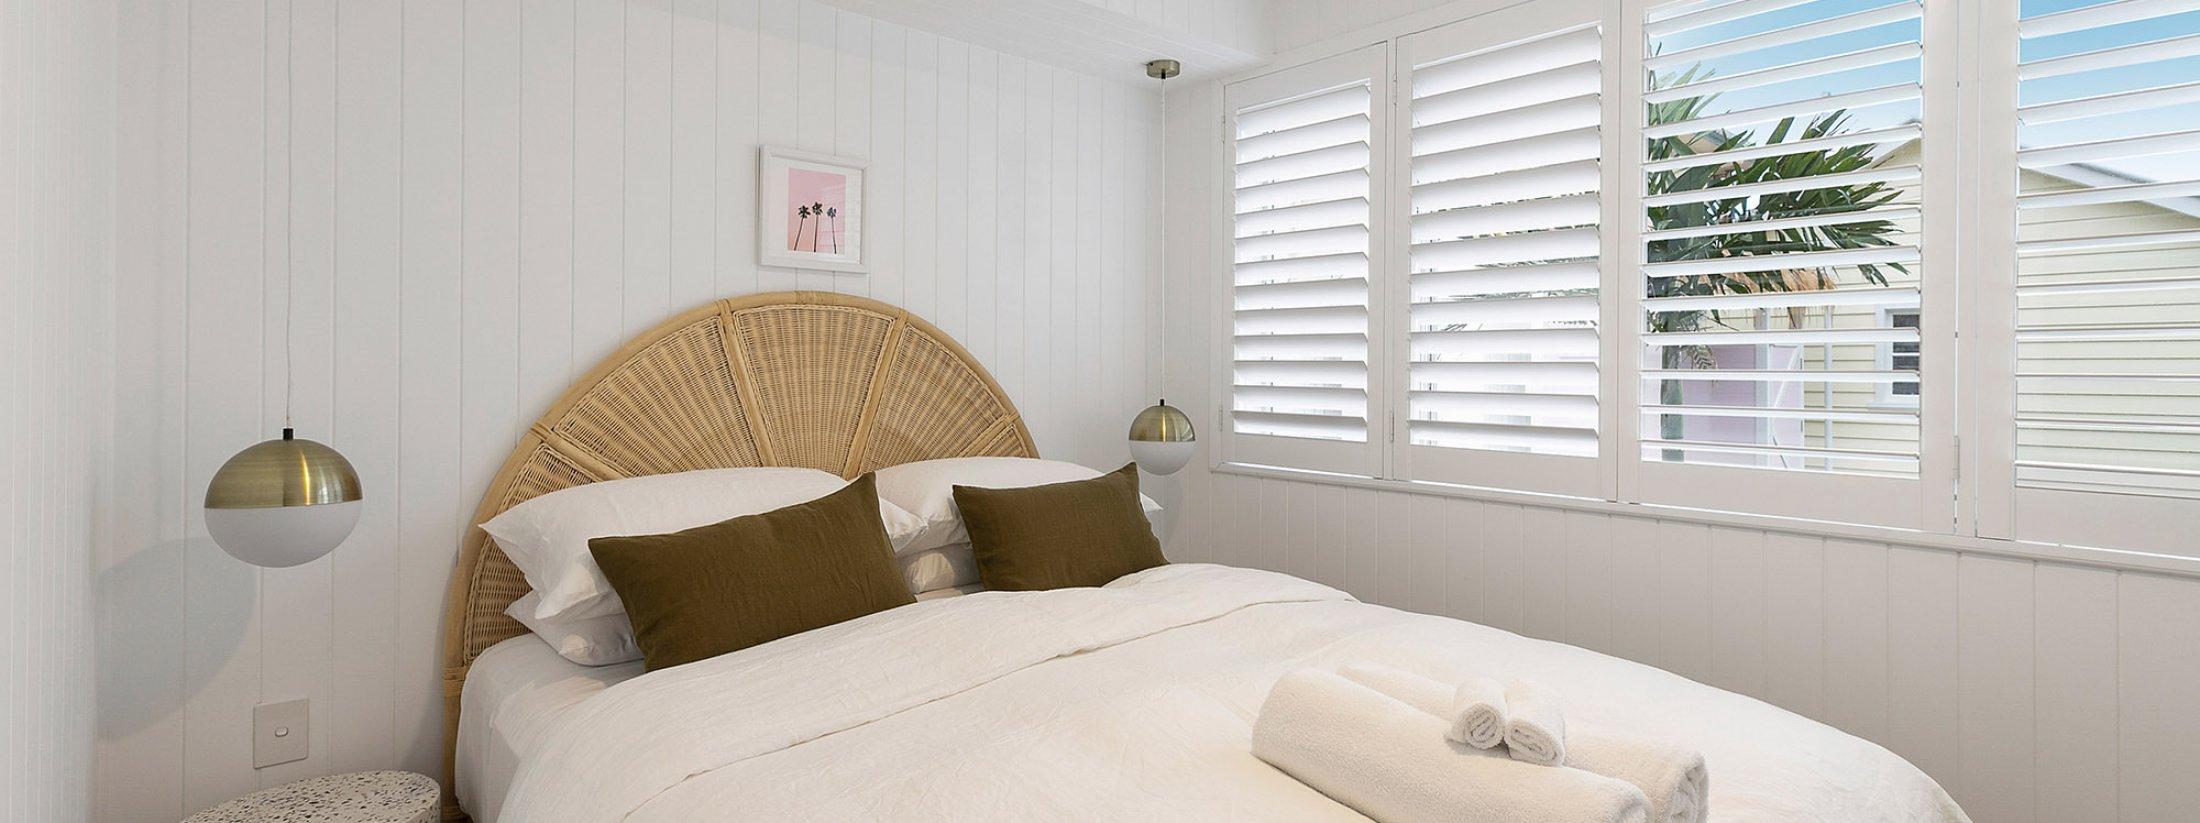 Sunset Beach - Riverside - Brunswick Heads - Queen Bedroom